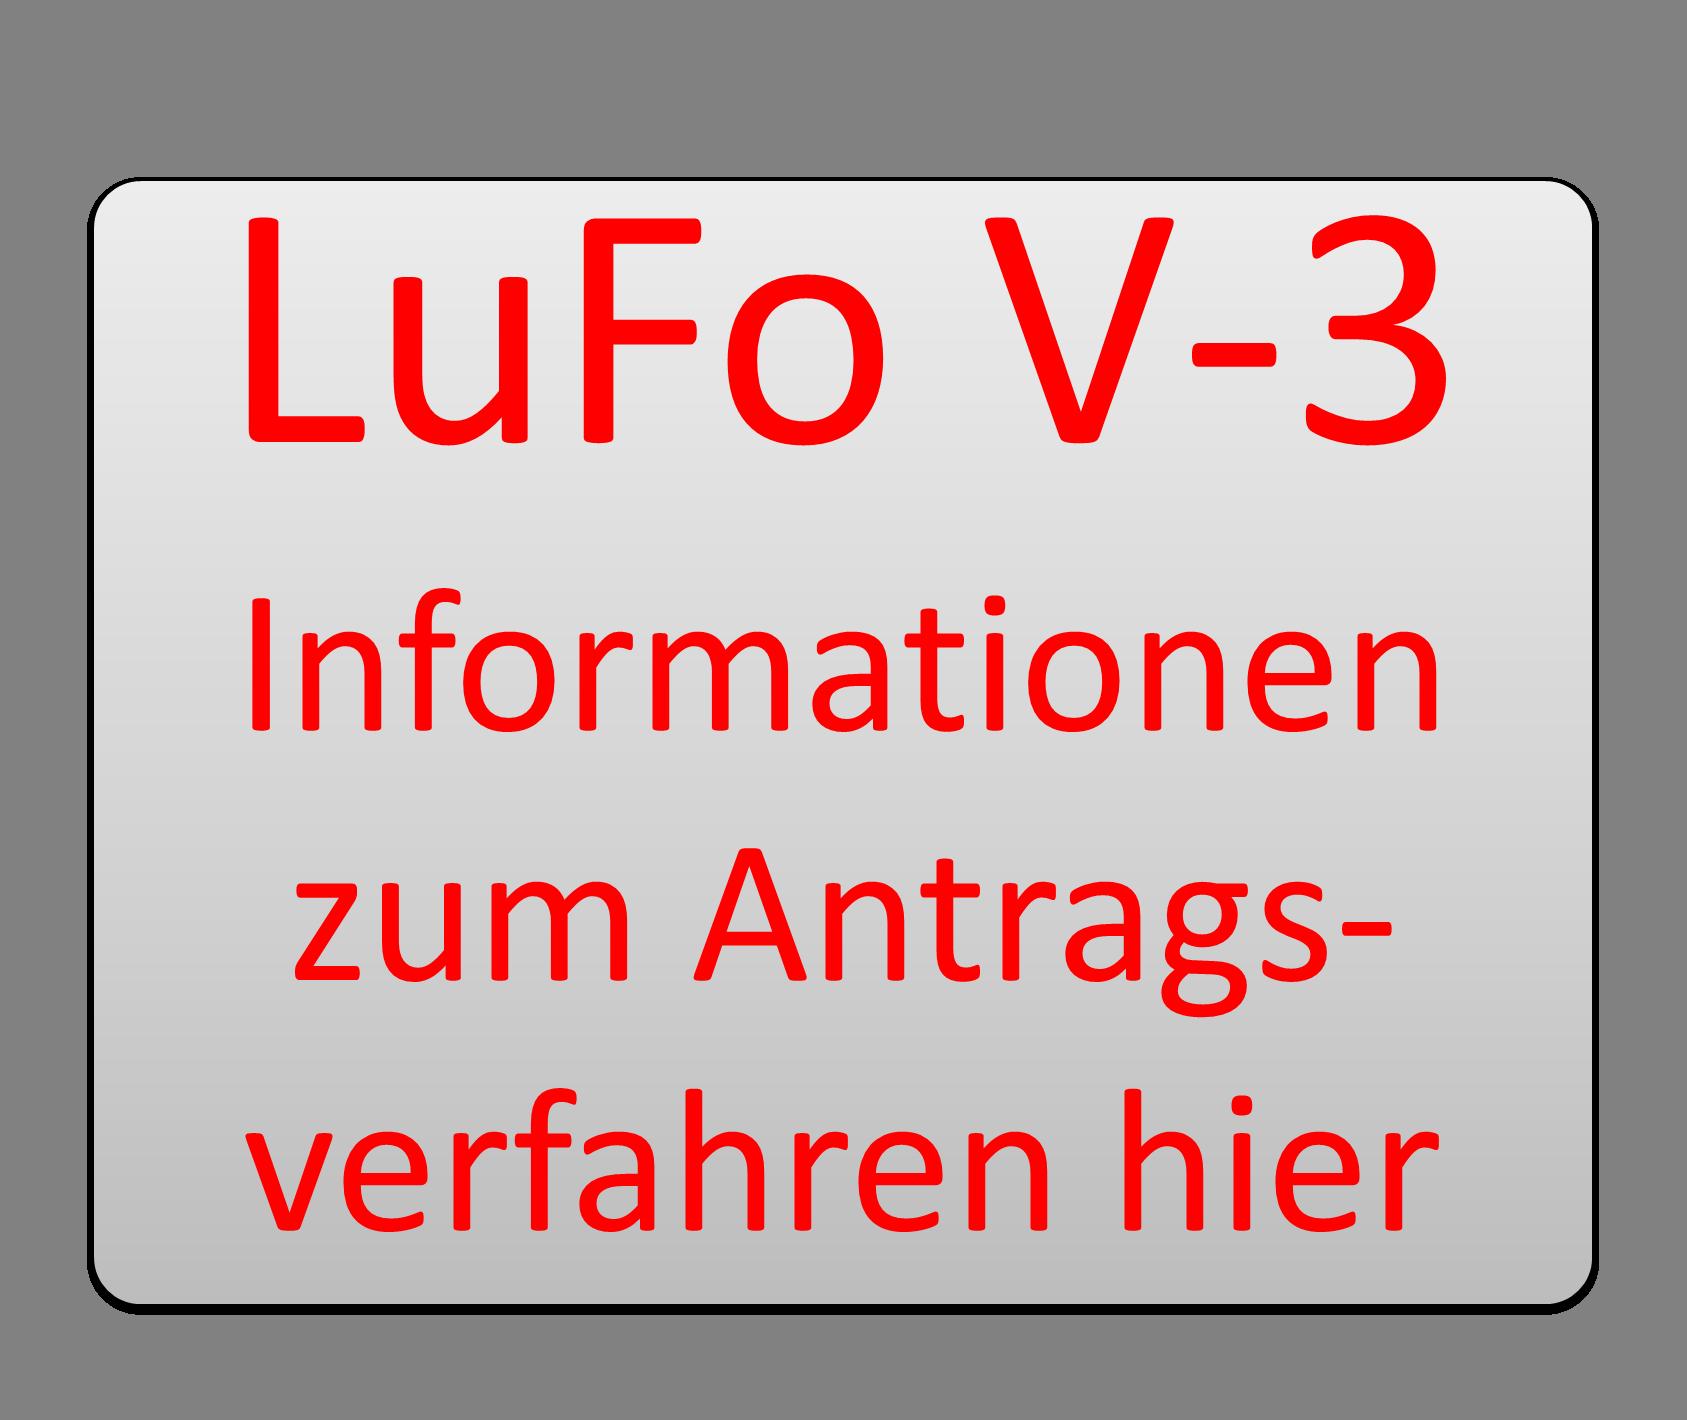 Teaser LuFo V-3 Antragsverfahren